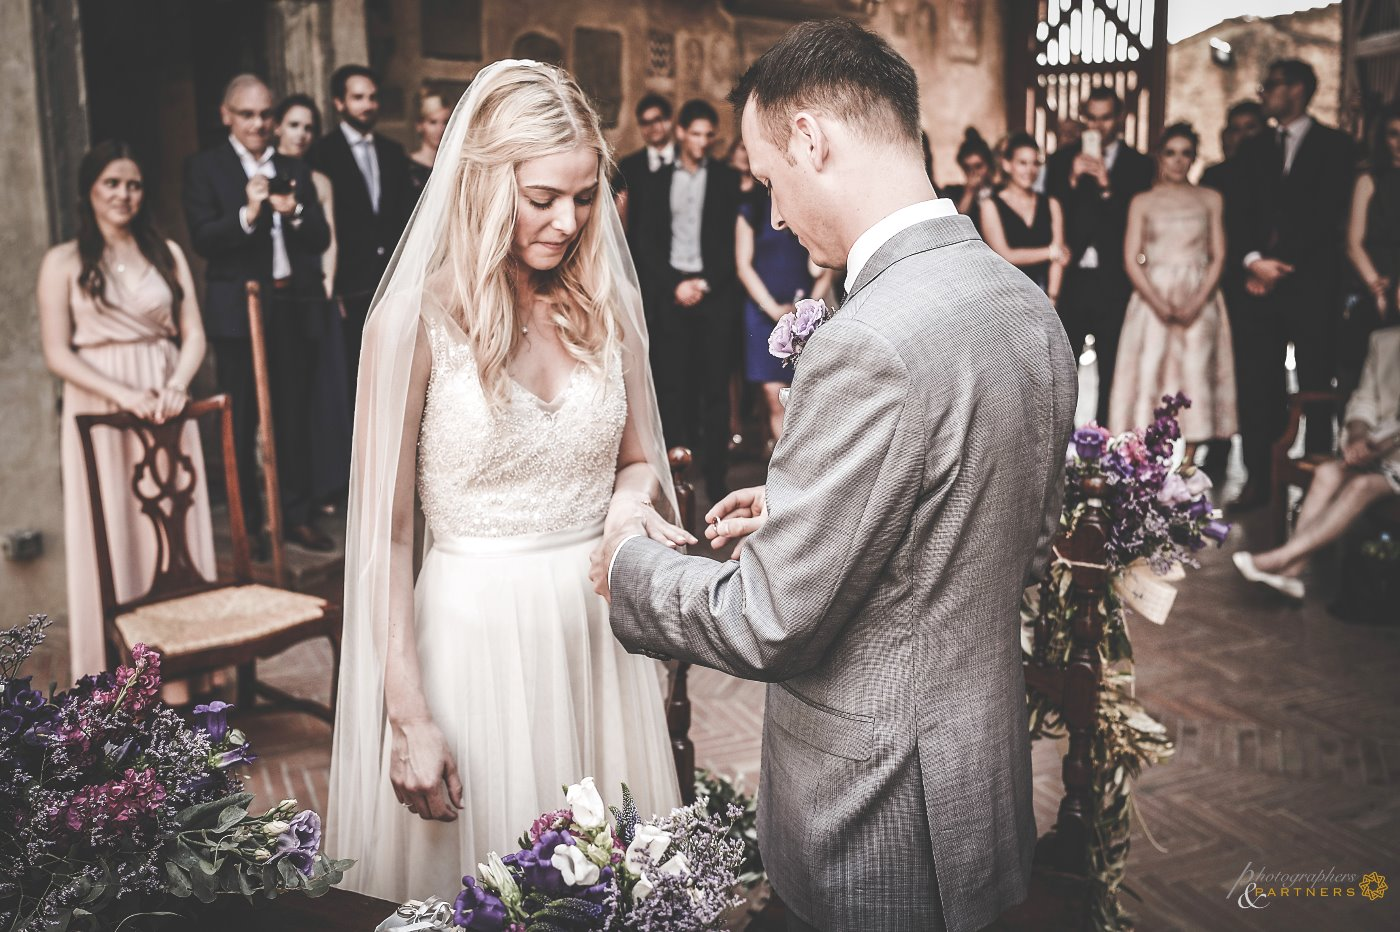 photographers_weddings_certaldo_07.jpg